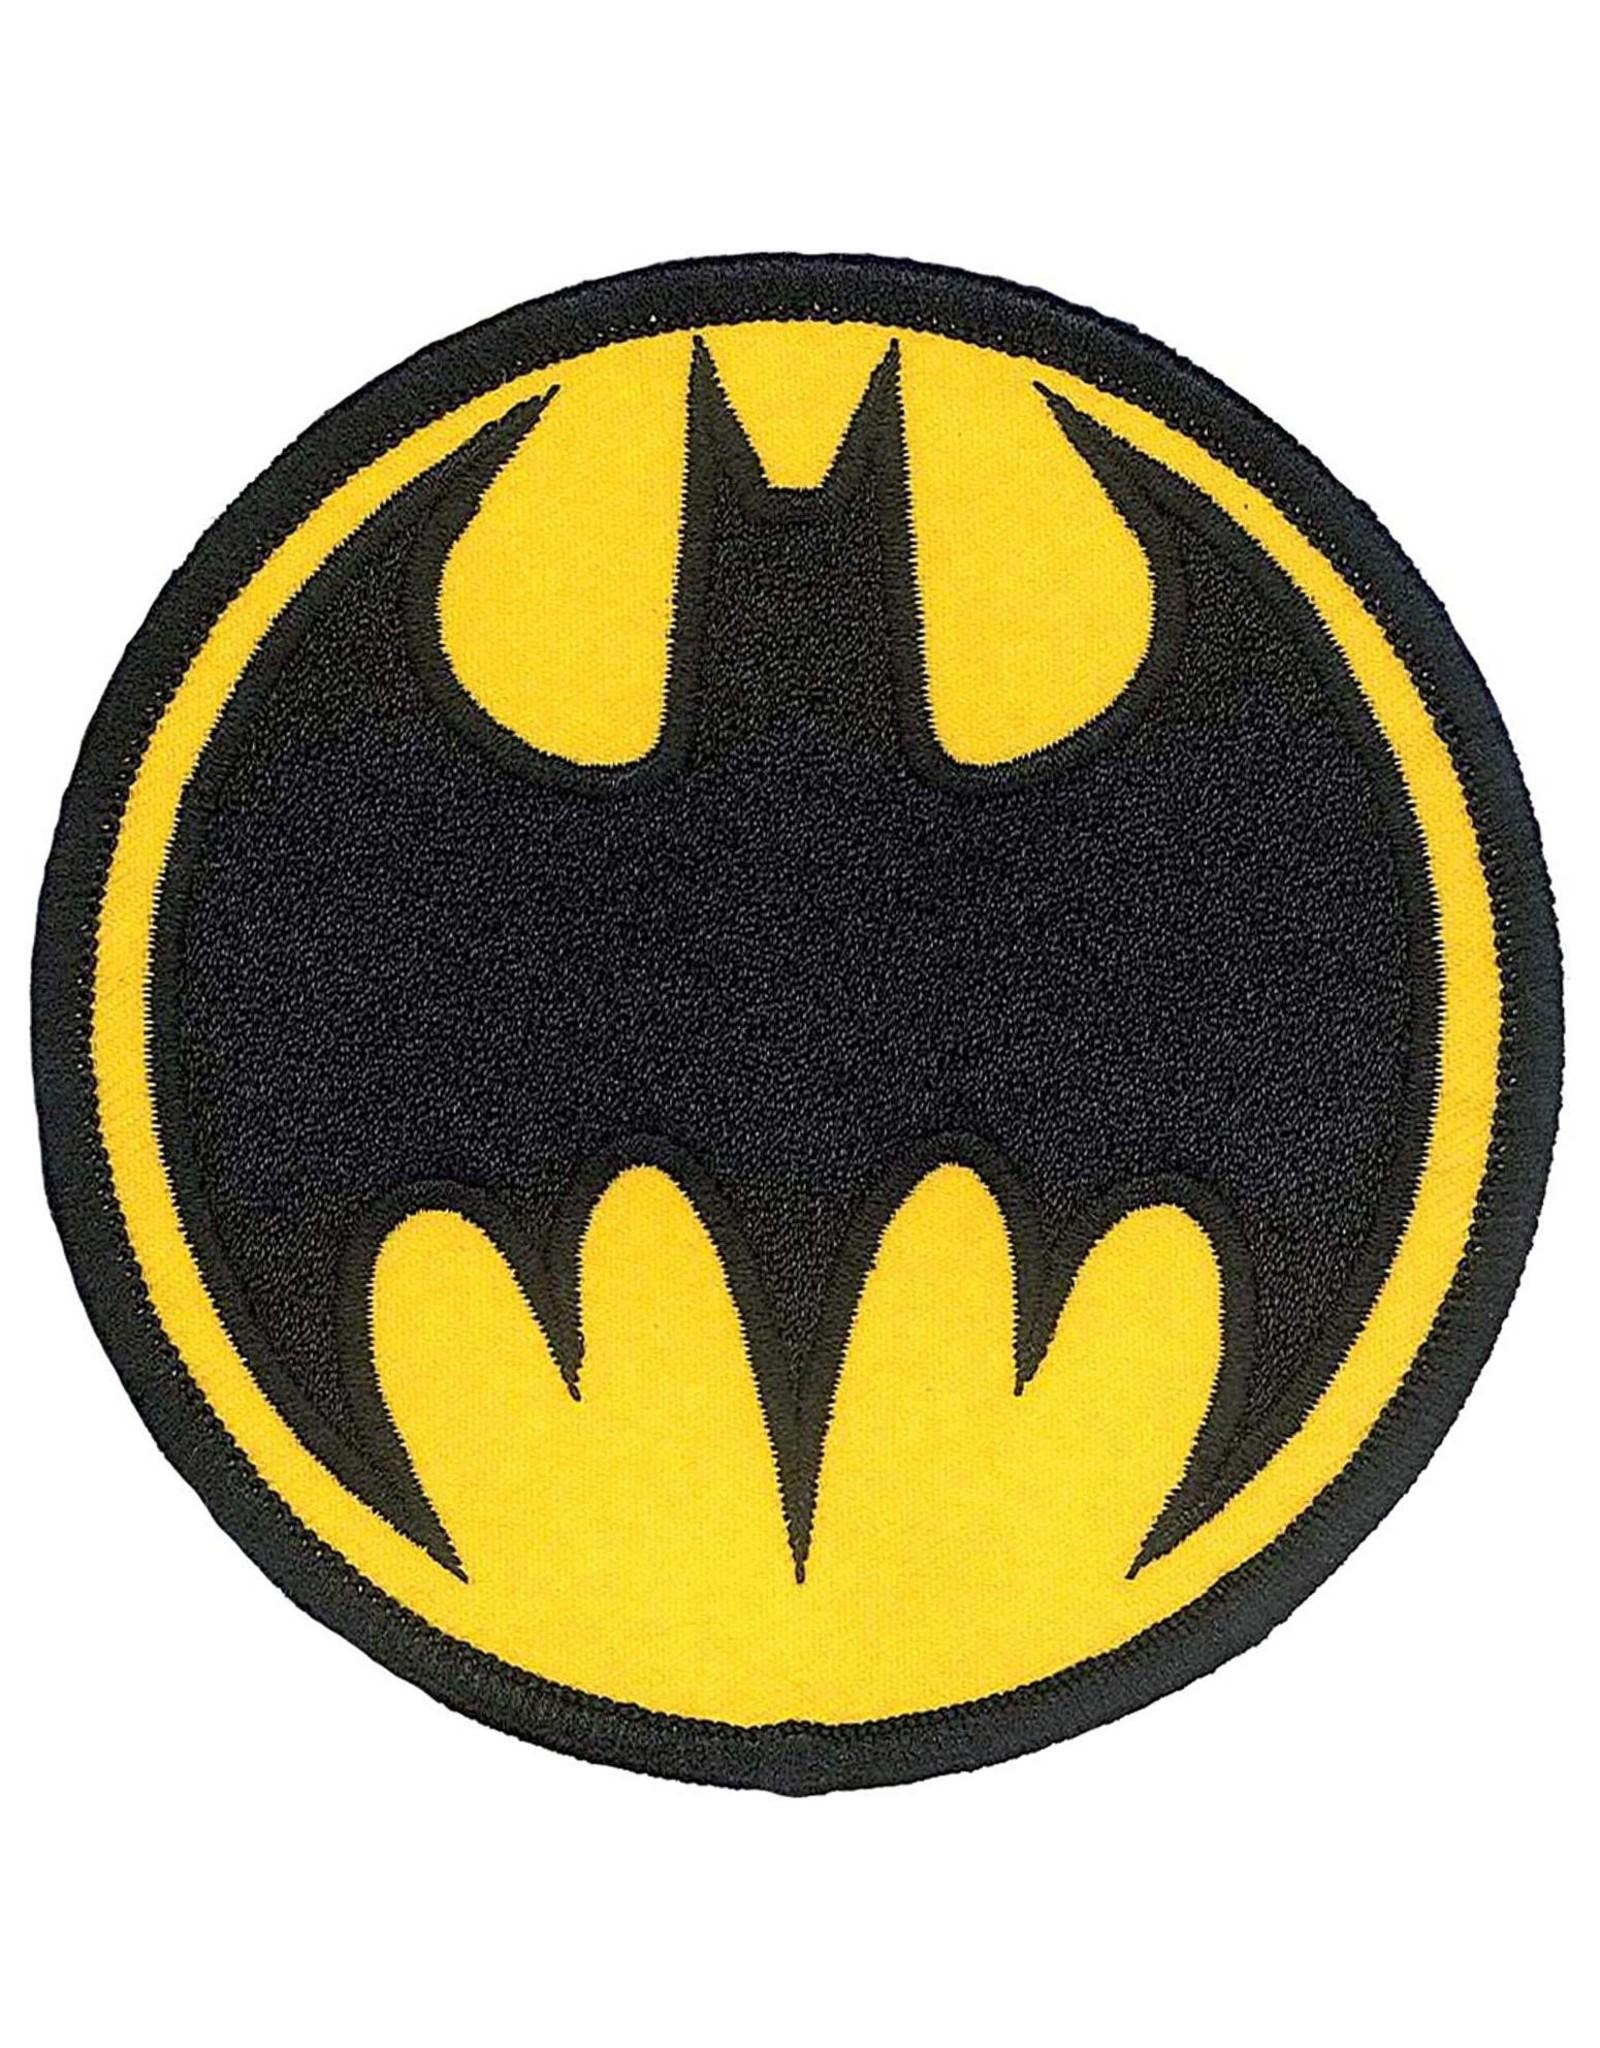 BATMAN SIGNAL IRON-ON PATCH